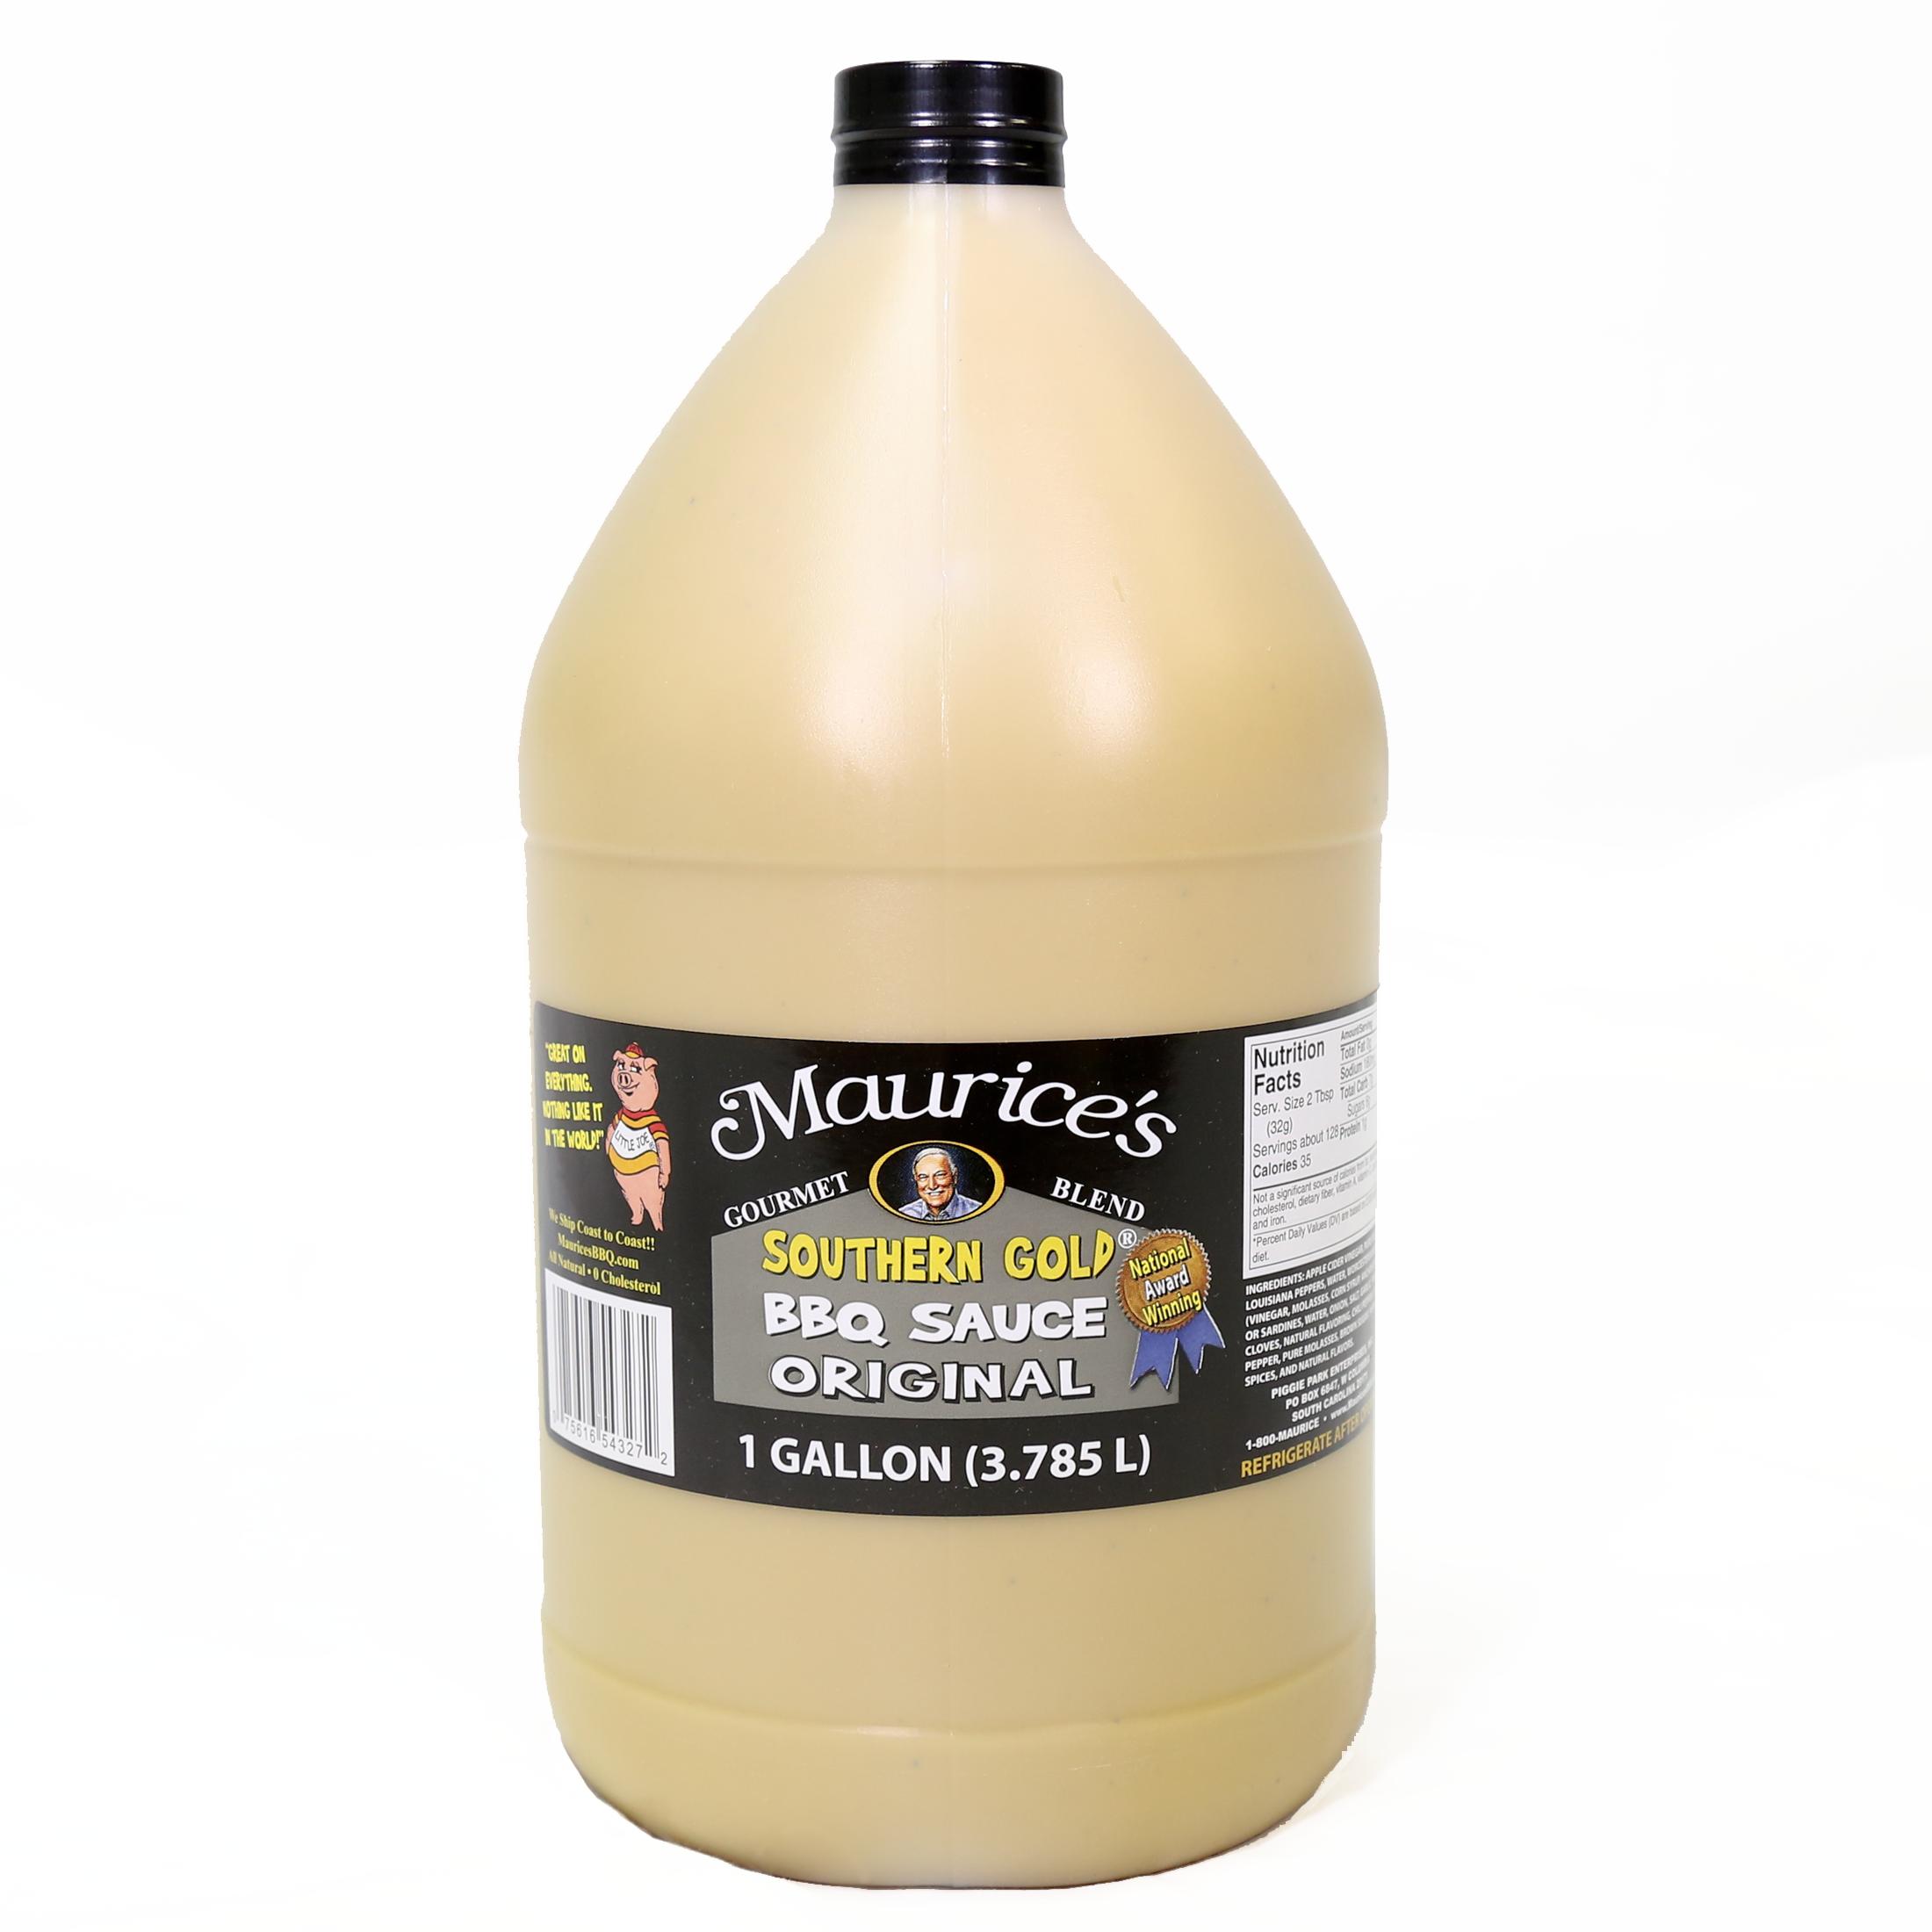 Southern Gold® BBQ Sauce, Gallon